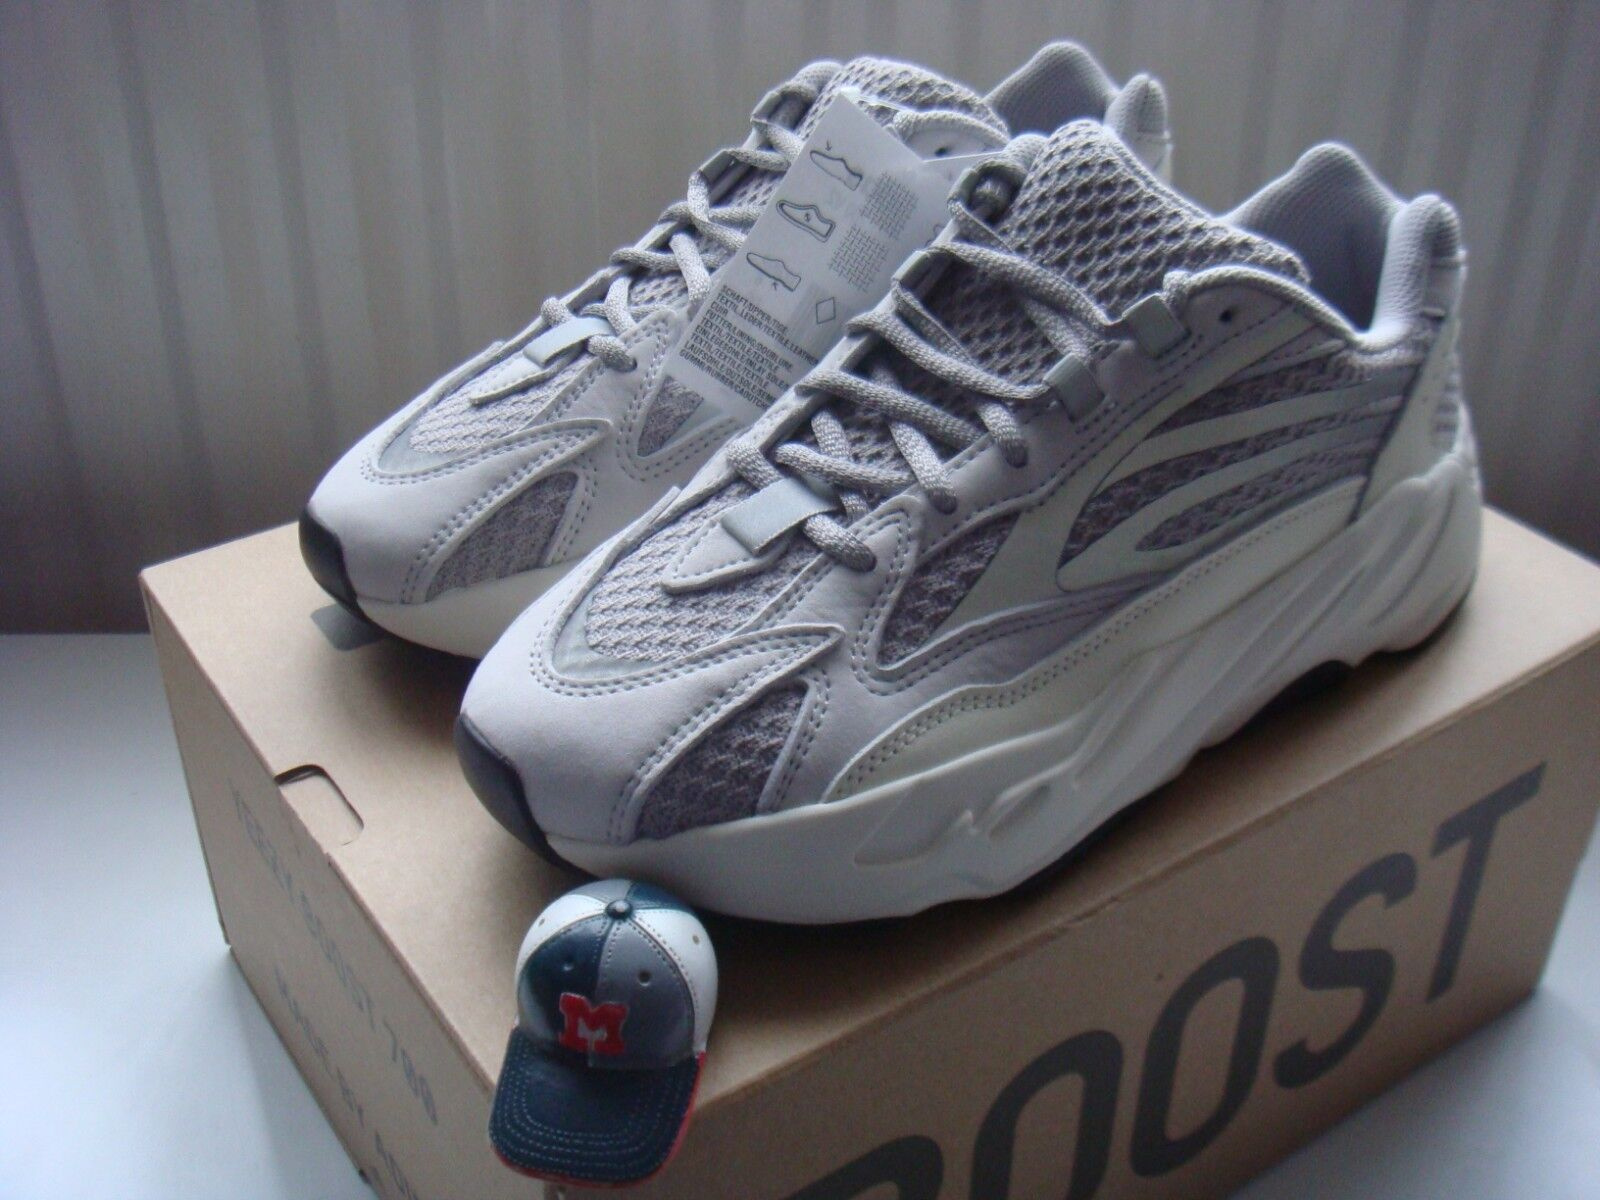 Adidas Yeezy Boost 700 V2 Static US 11   3 YZY Kanye OG Inertia